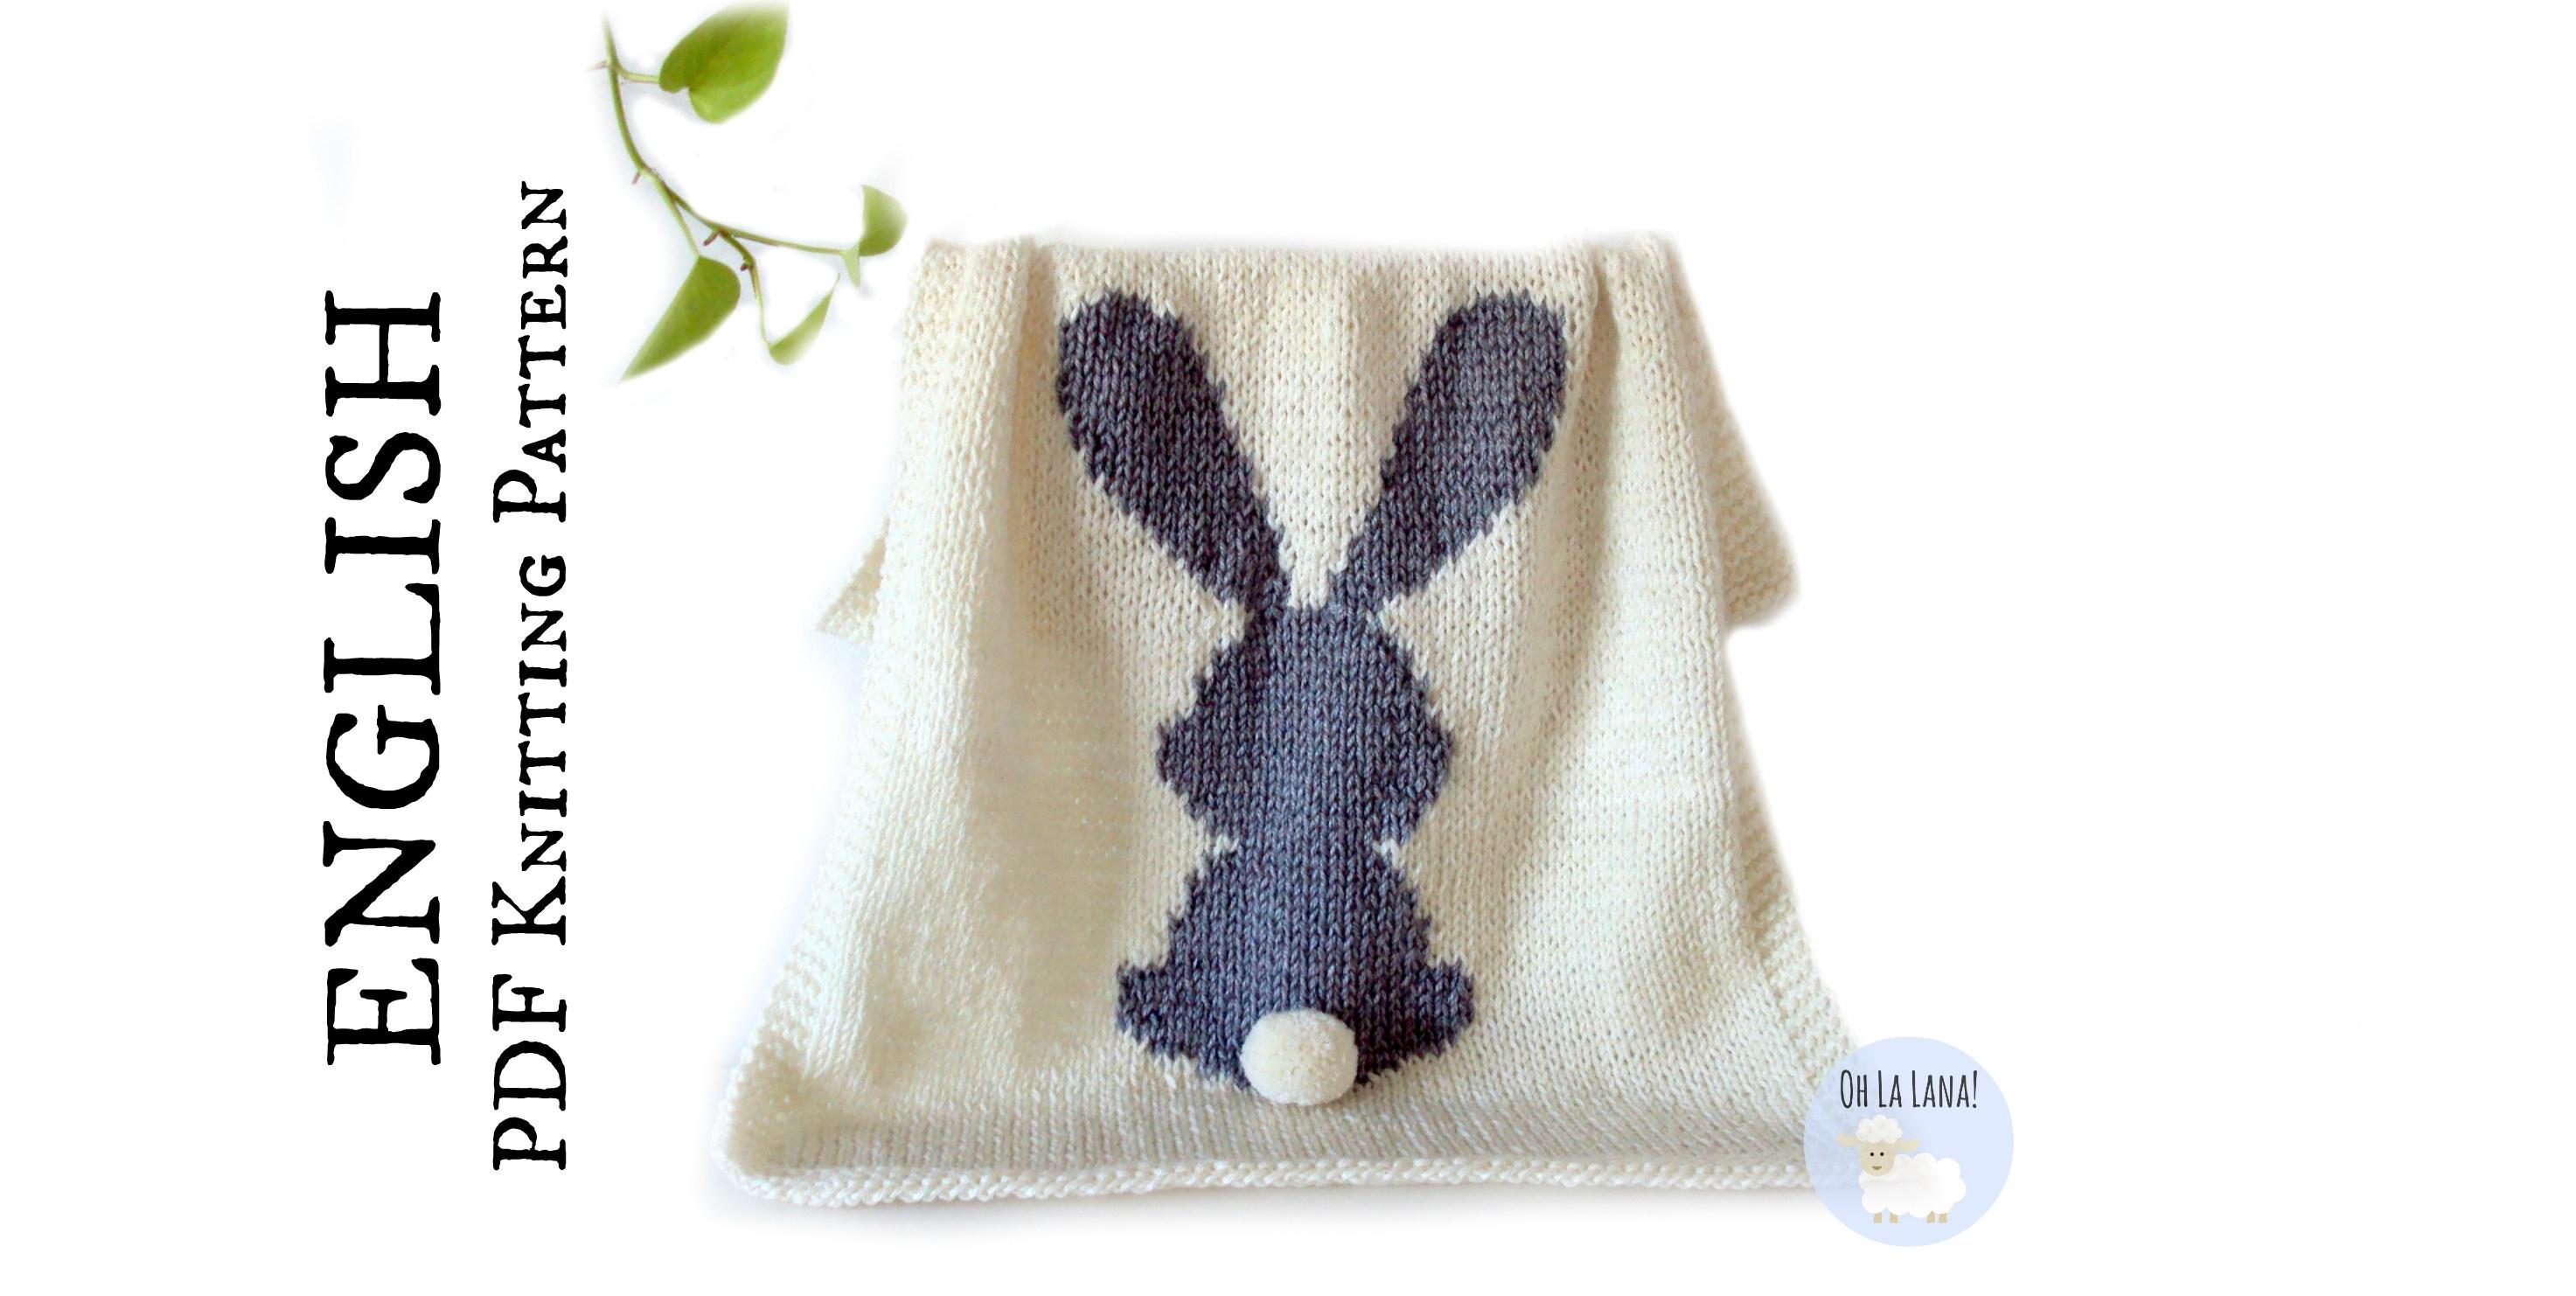 dff7e8557ff HOW TO  INTARSIA - BUNNY BABY BLANKET PATTERN - Oh La Lana! Knitting Blog